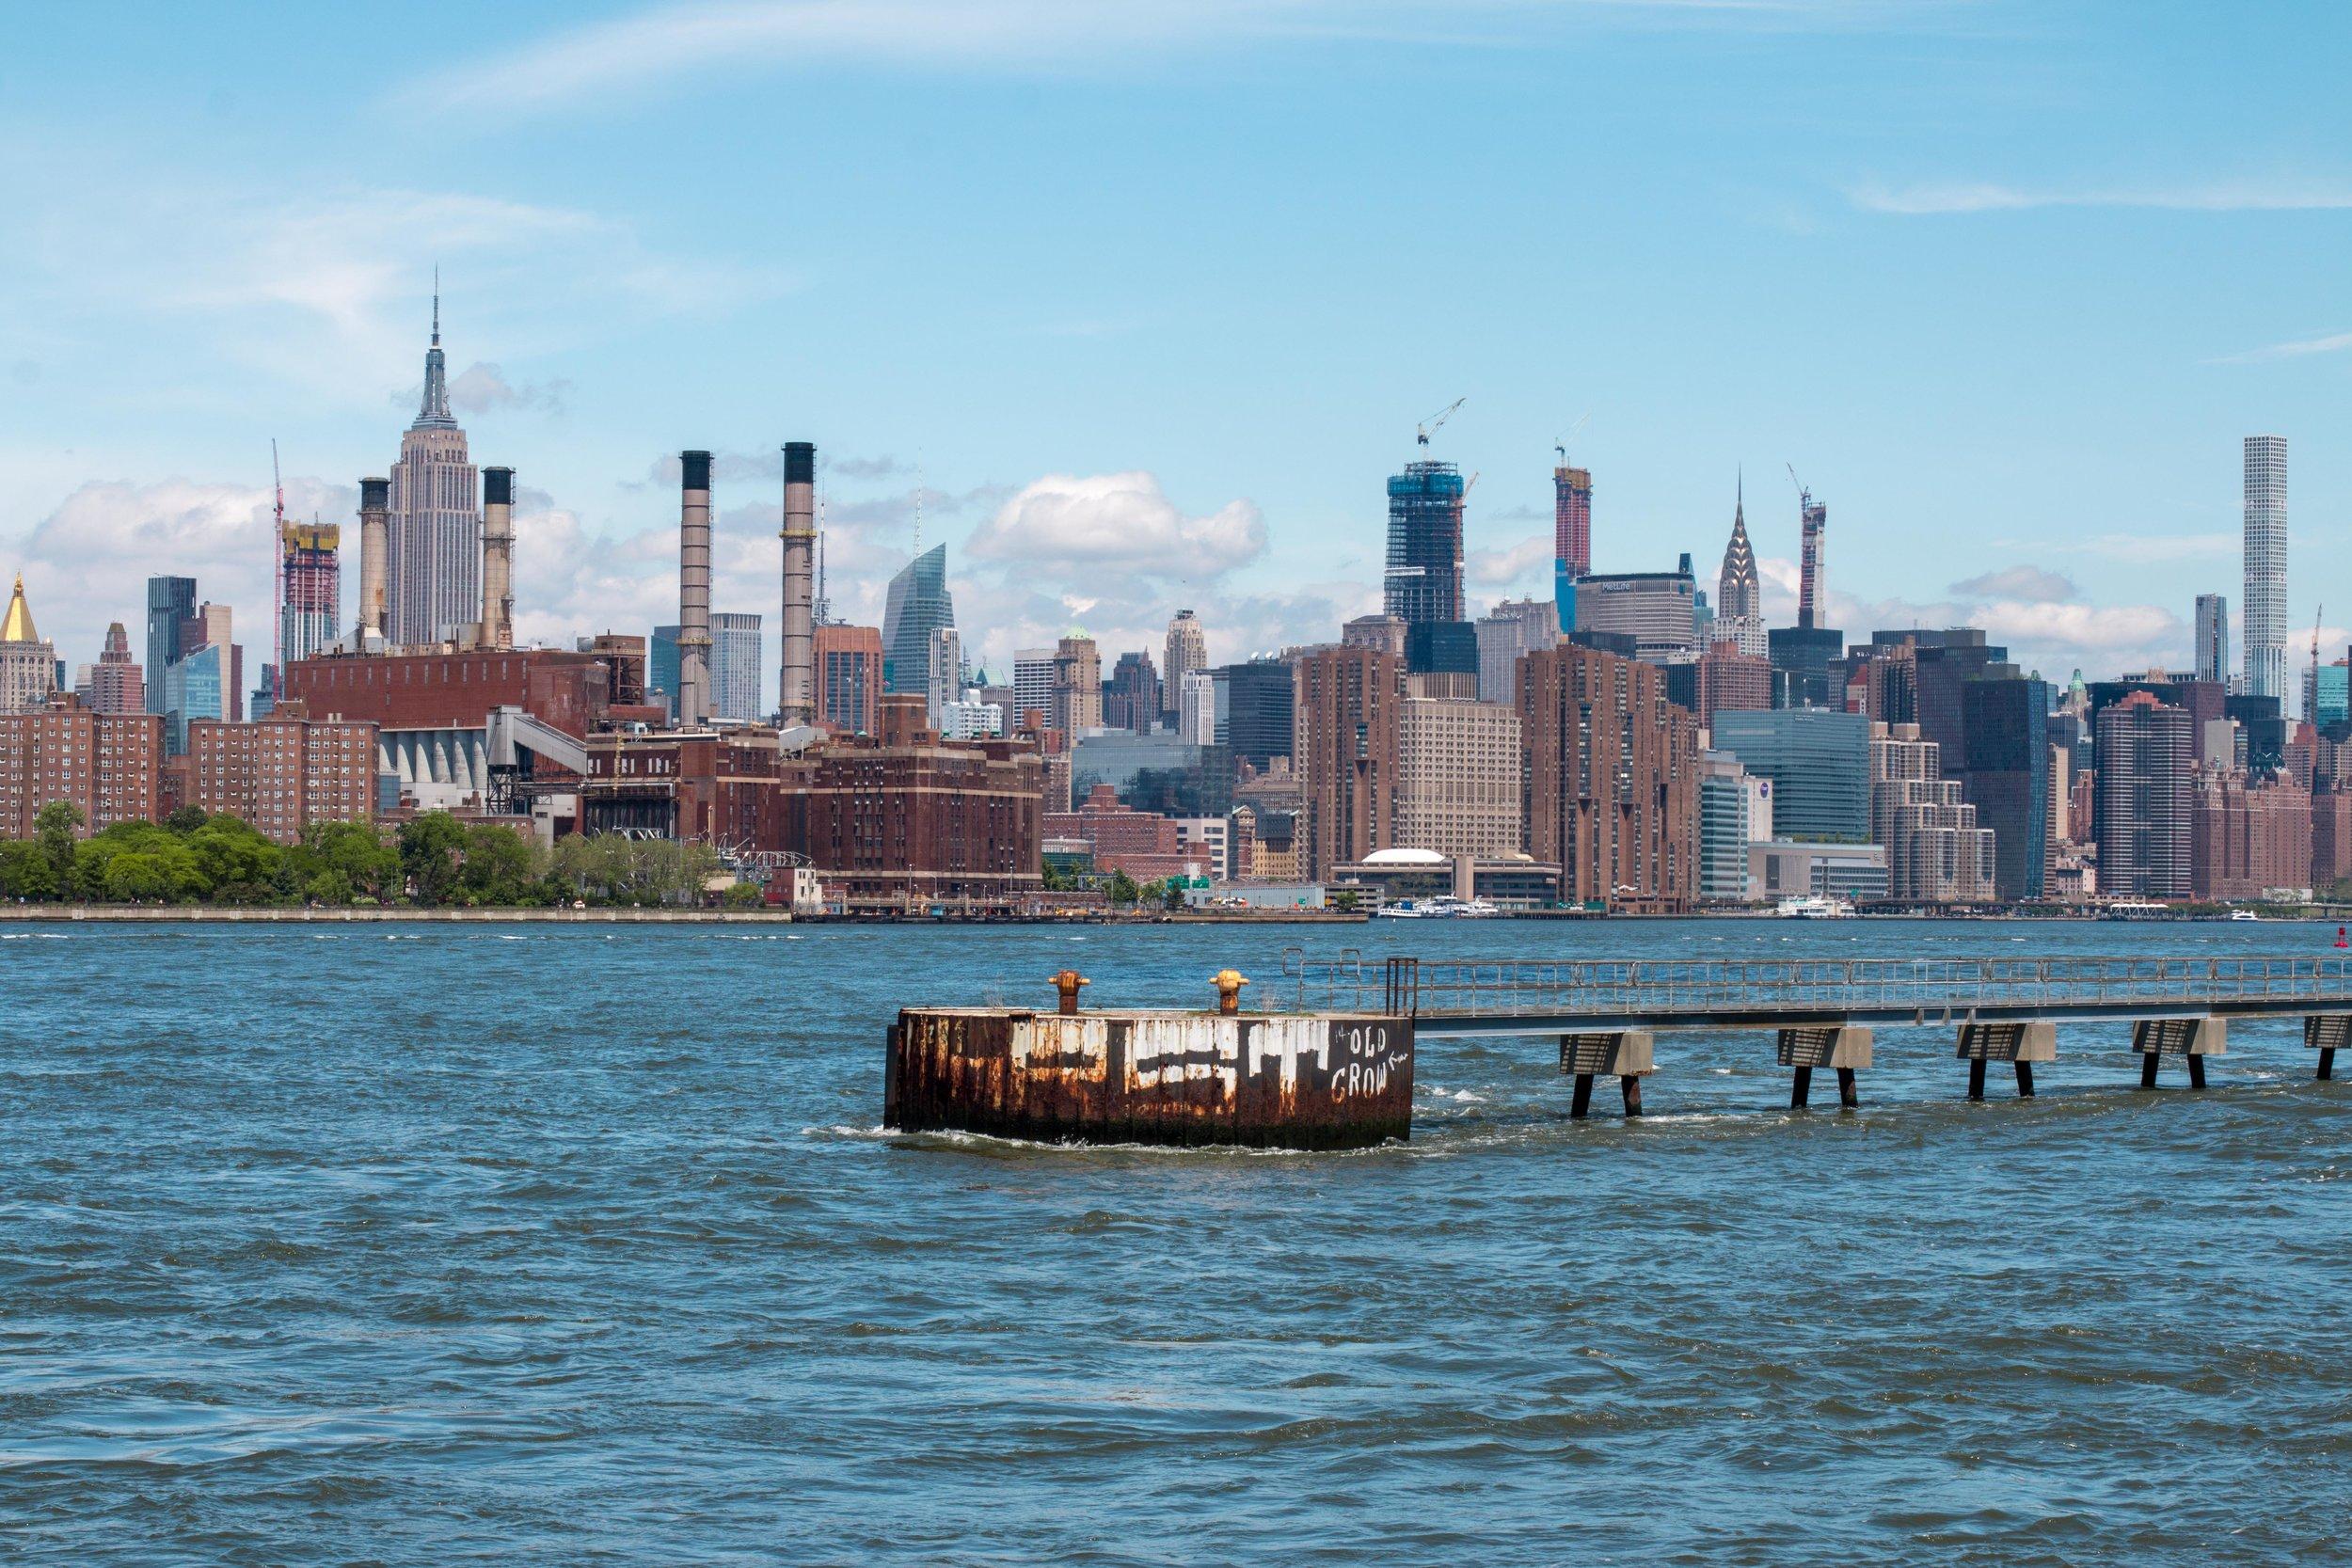 20190525-NYC Bianca Visit- 7360.jpg